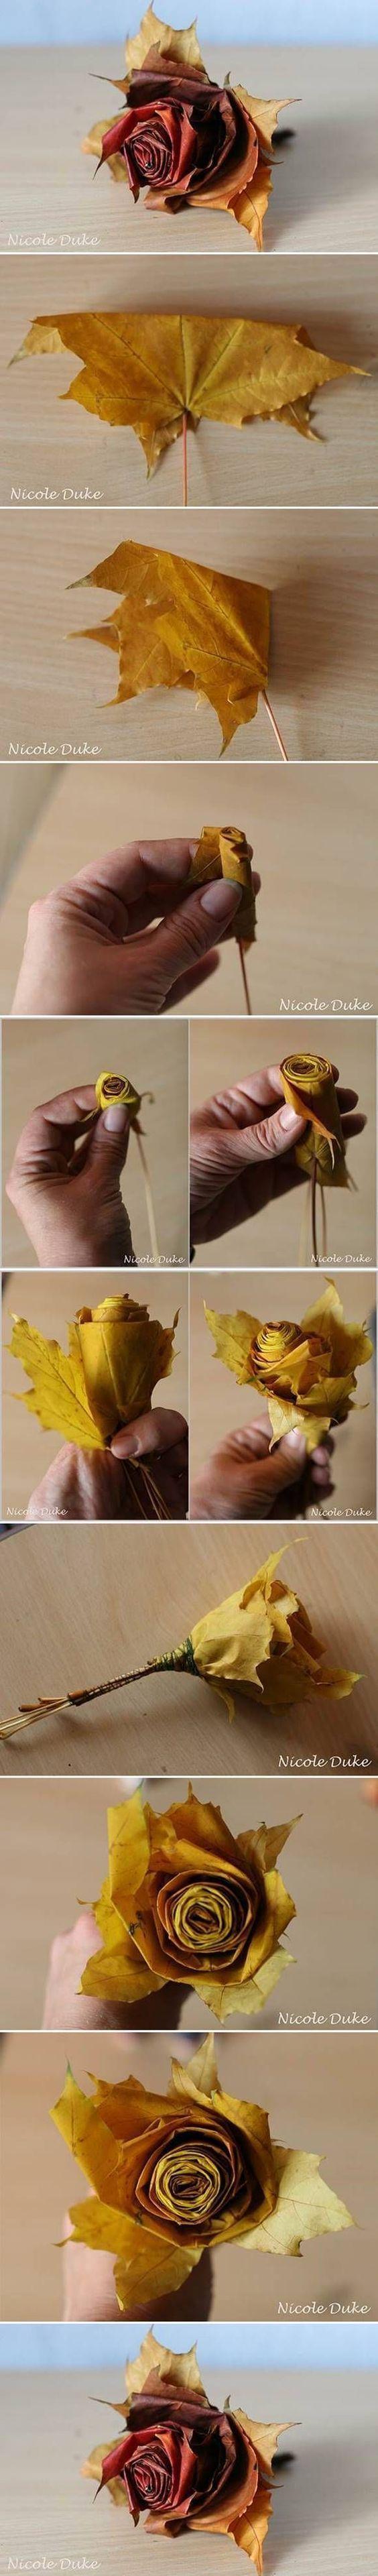 Herbstdeko selber machen - 15 DIY Bastelideen - Blattrose